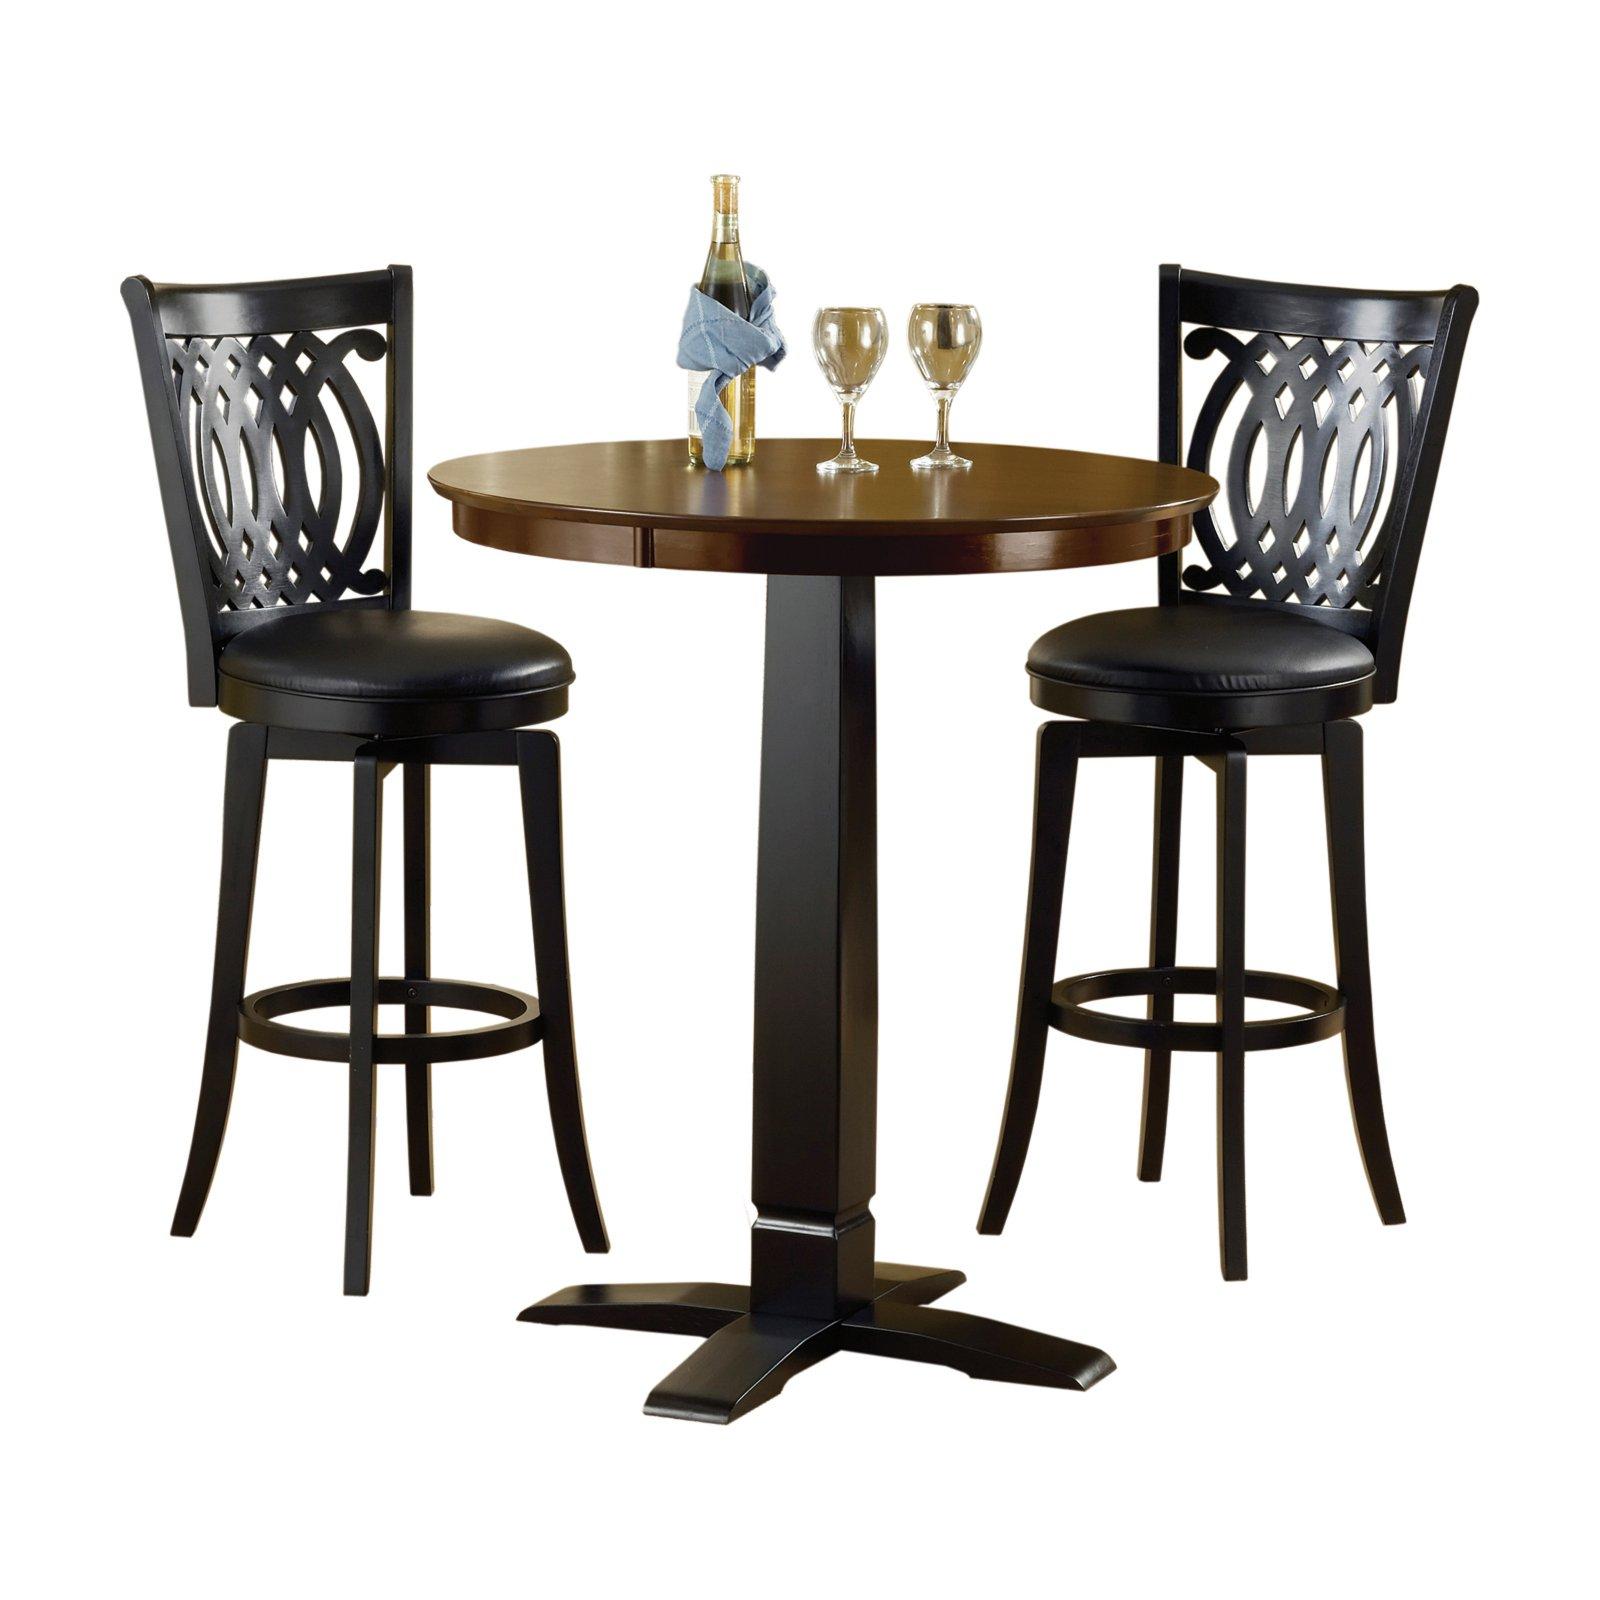 Hillsdale Furniture Van Draus 3 Piece Pub Table Set